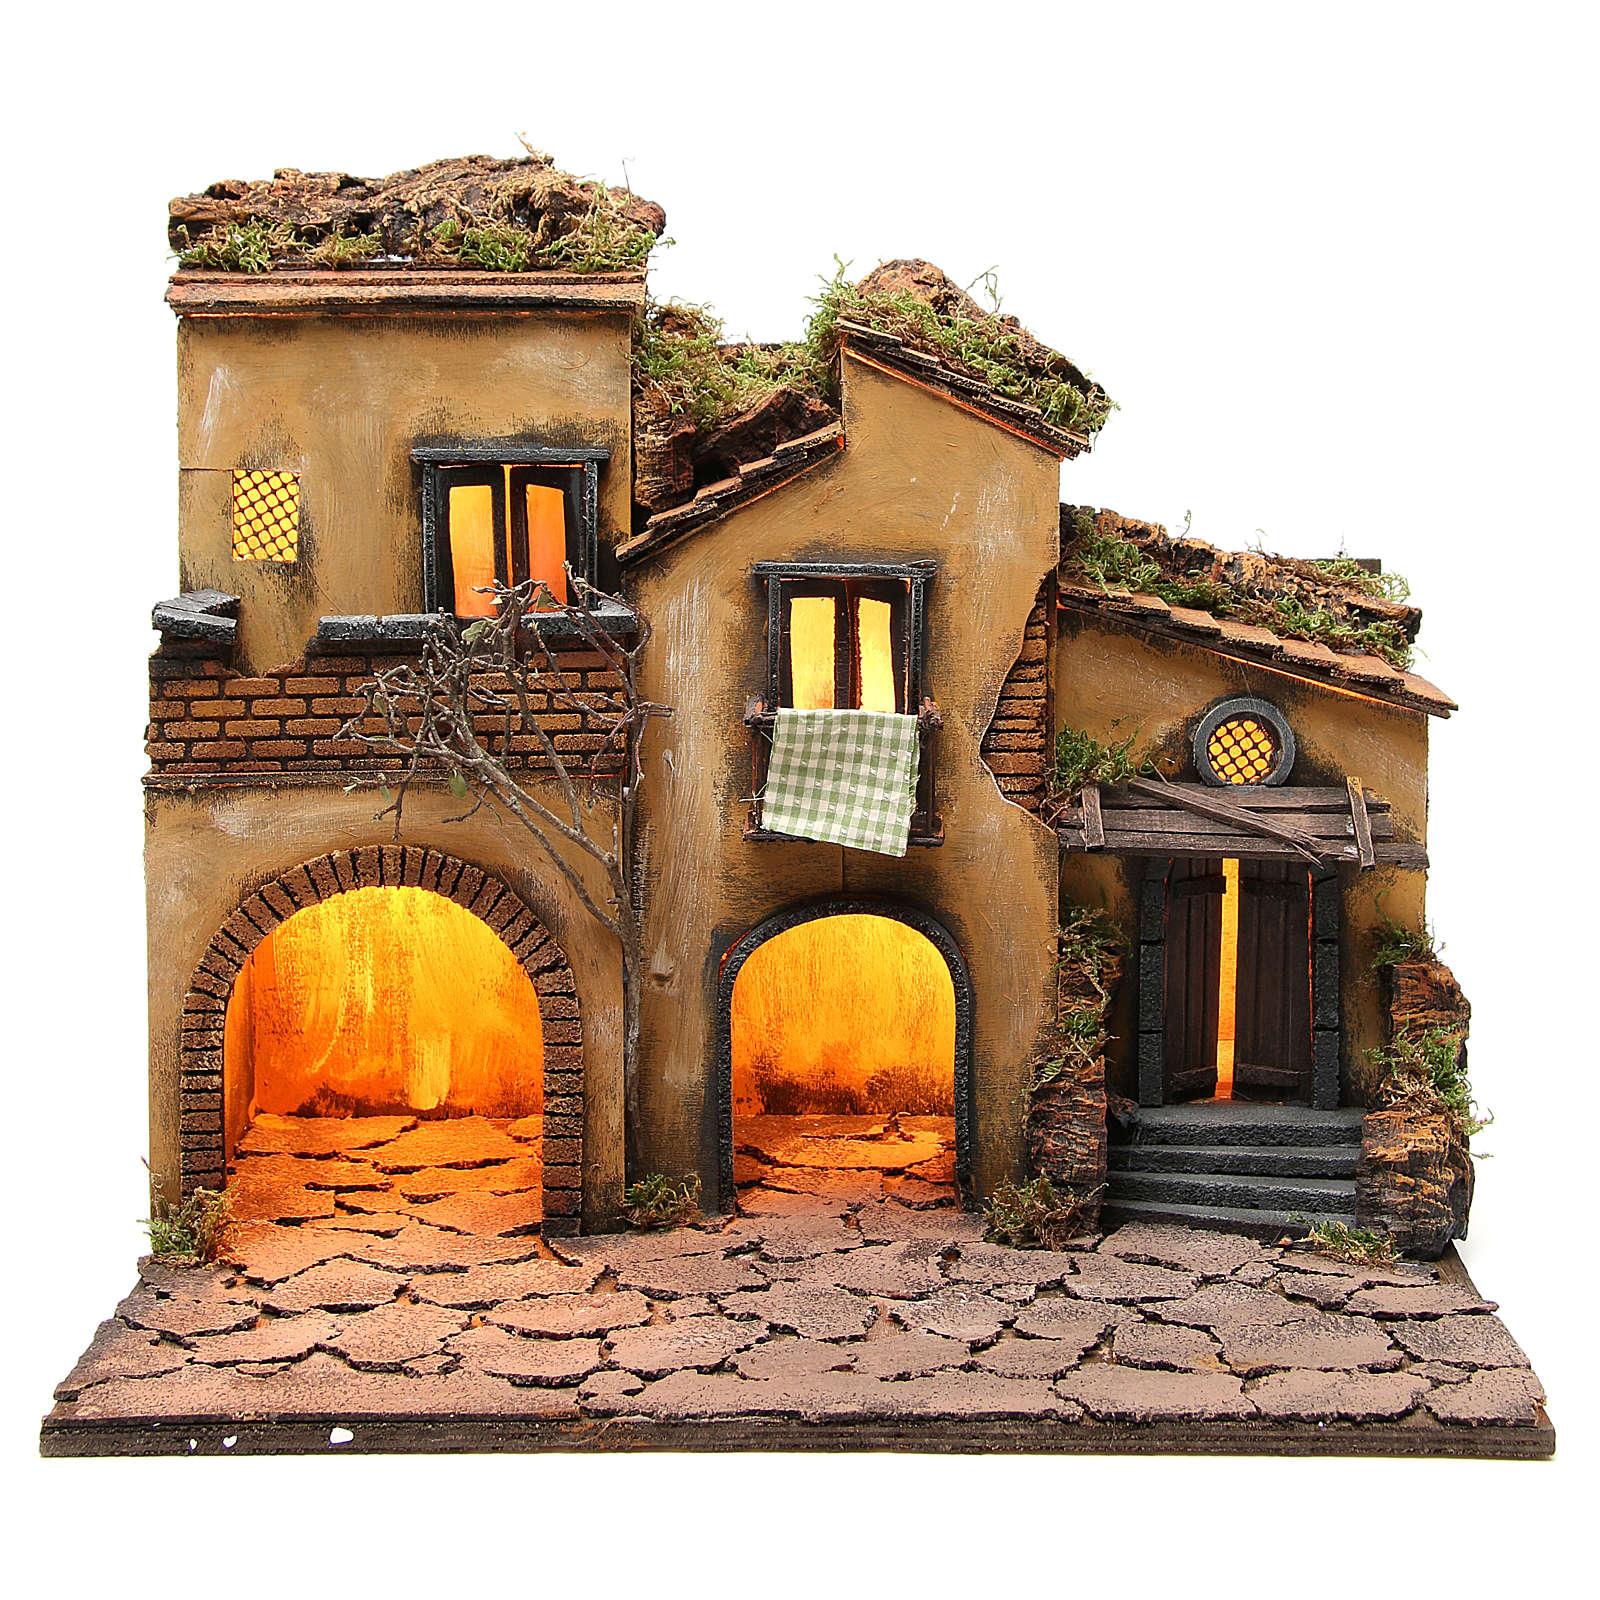 Borgo presepe napoletano stile 700 con 3 case e luce 57x50x40 4